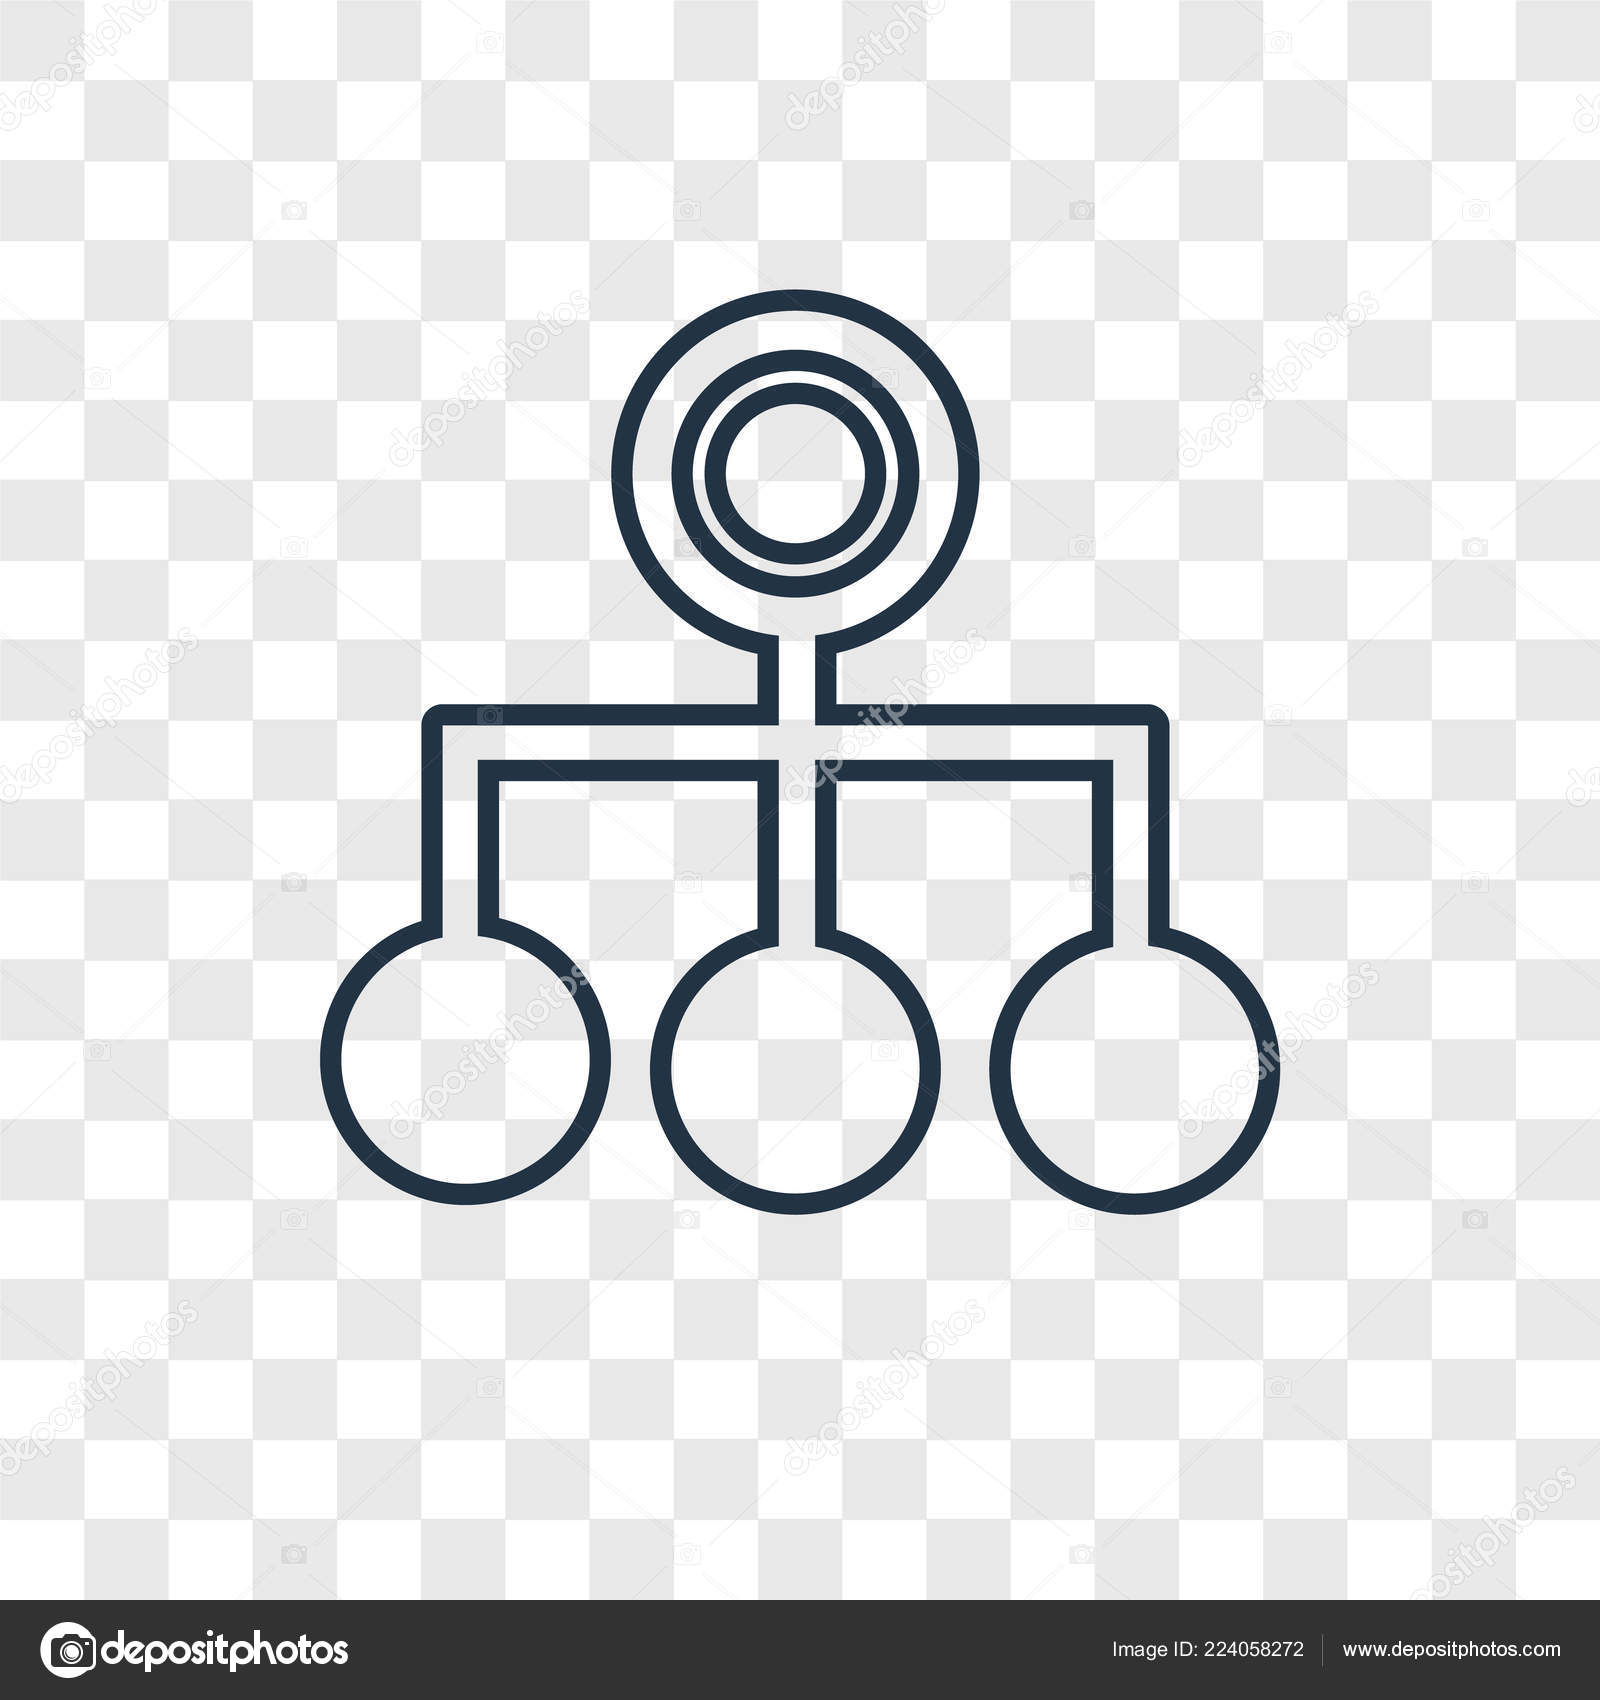 Estructura Jerárquica Concepto Vector Lineal Icono Aislado